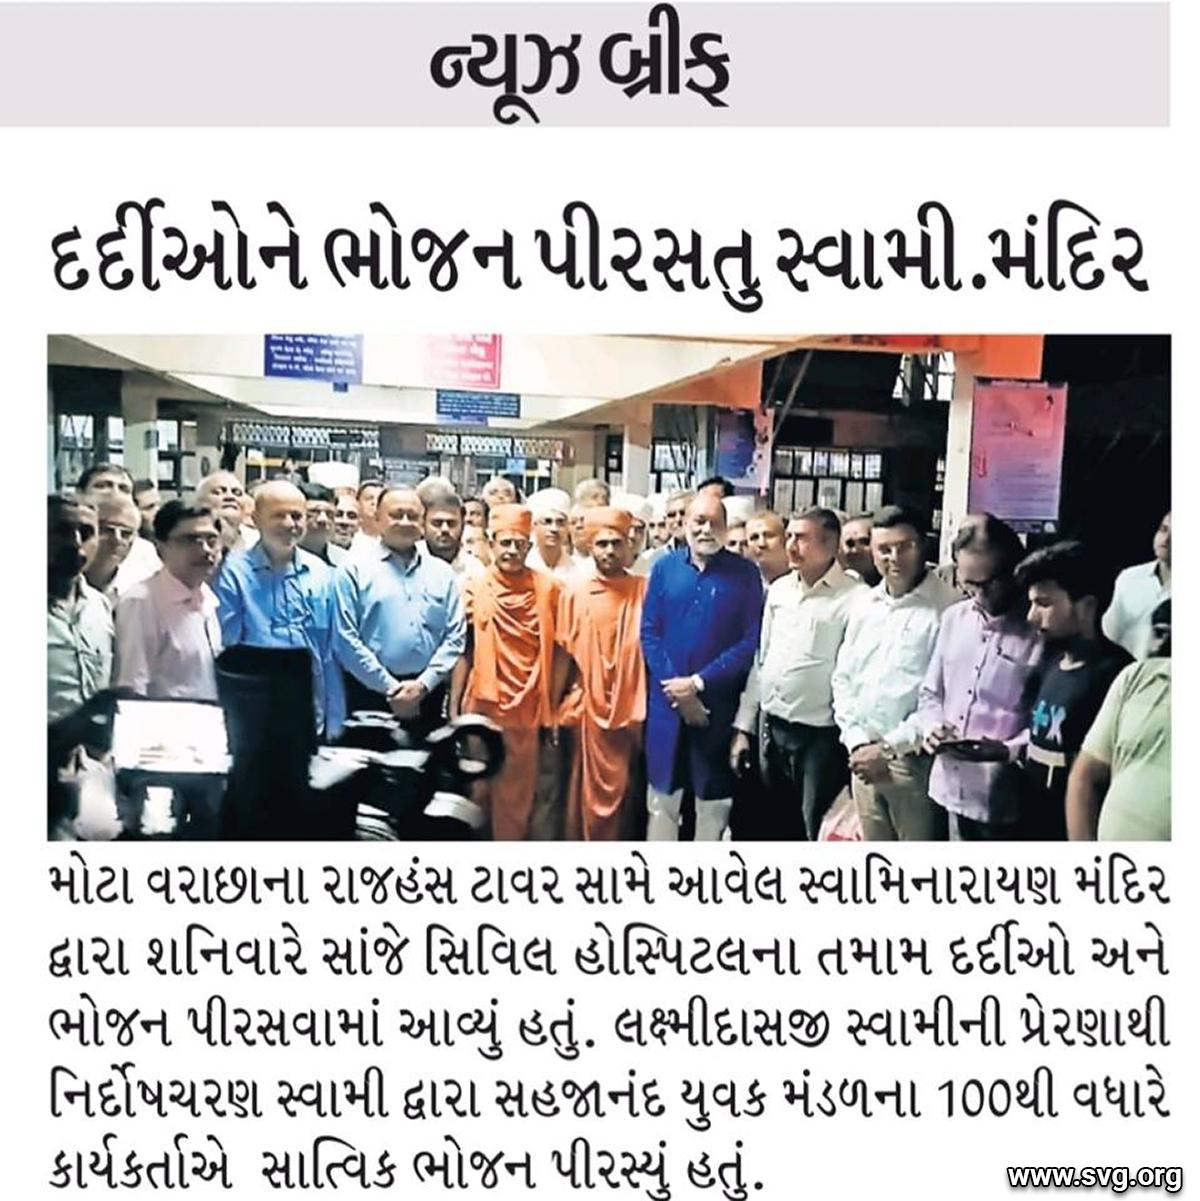 Flood Relief Fundraising by Swaminarayan Mandir Mota Varachha 2019 25